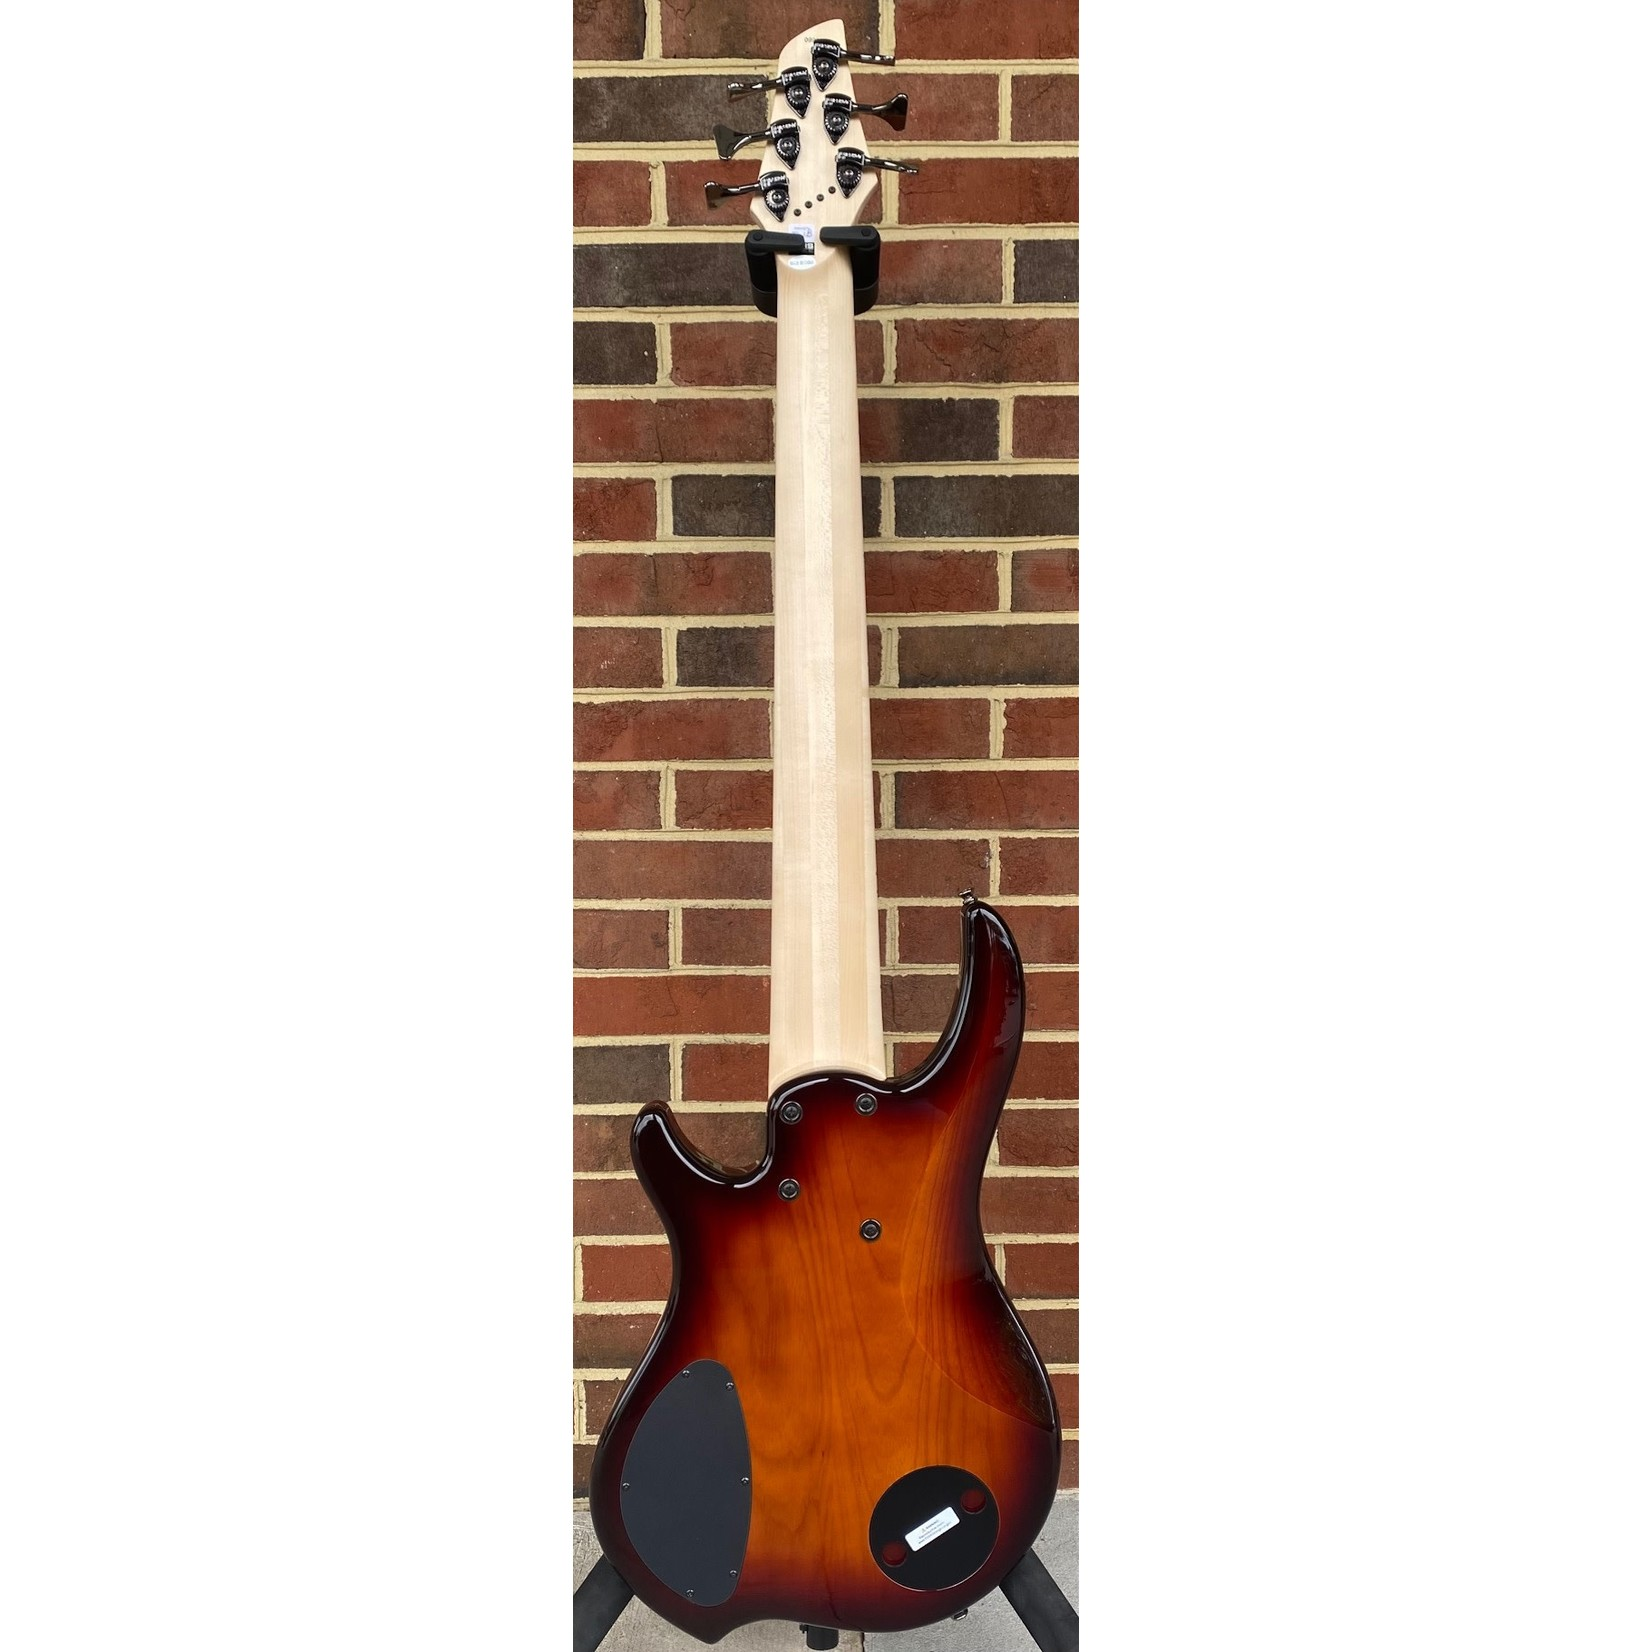 Dingwall Dingwall Combustion 6-String, 3x Pickups, Vintageburst, Quilted Maple Top, Swamp Ash Body, Maple Fretboard, Dingwall Gig Bag, SN# 9936